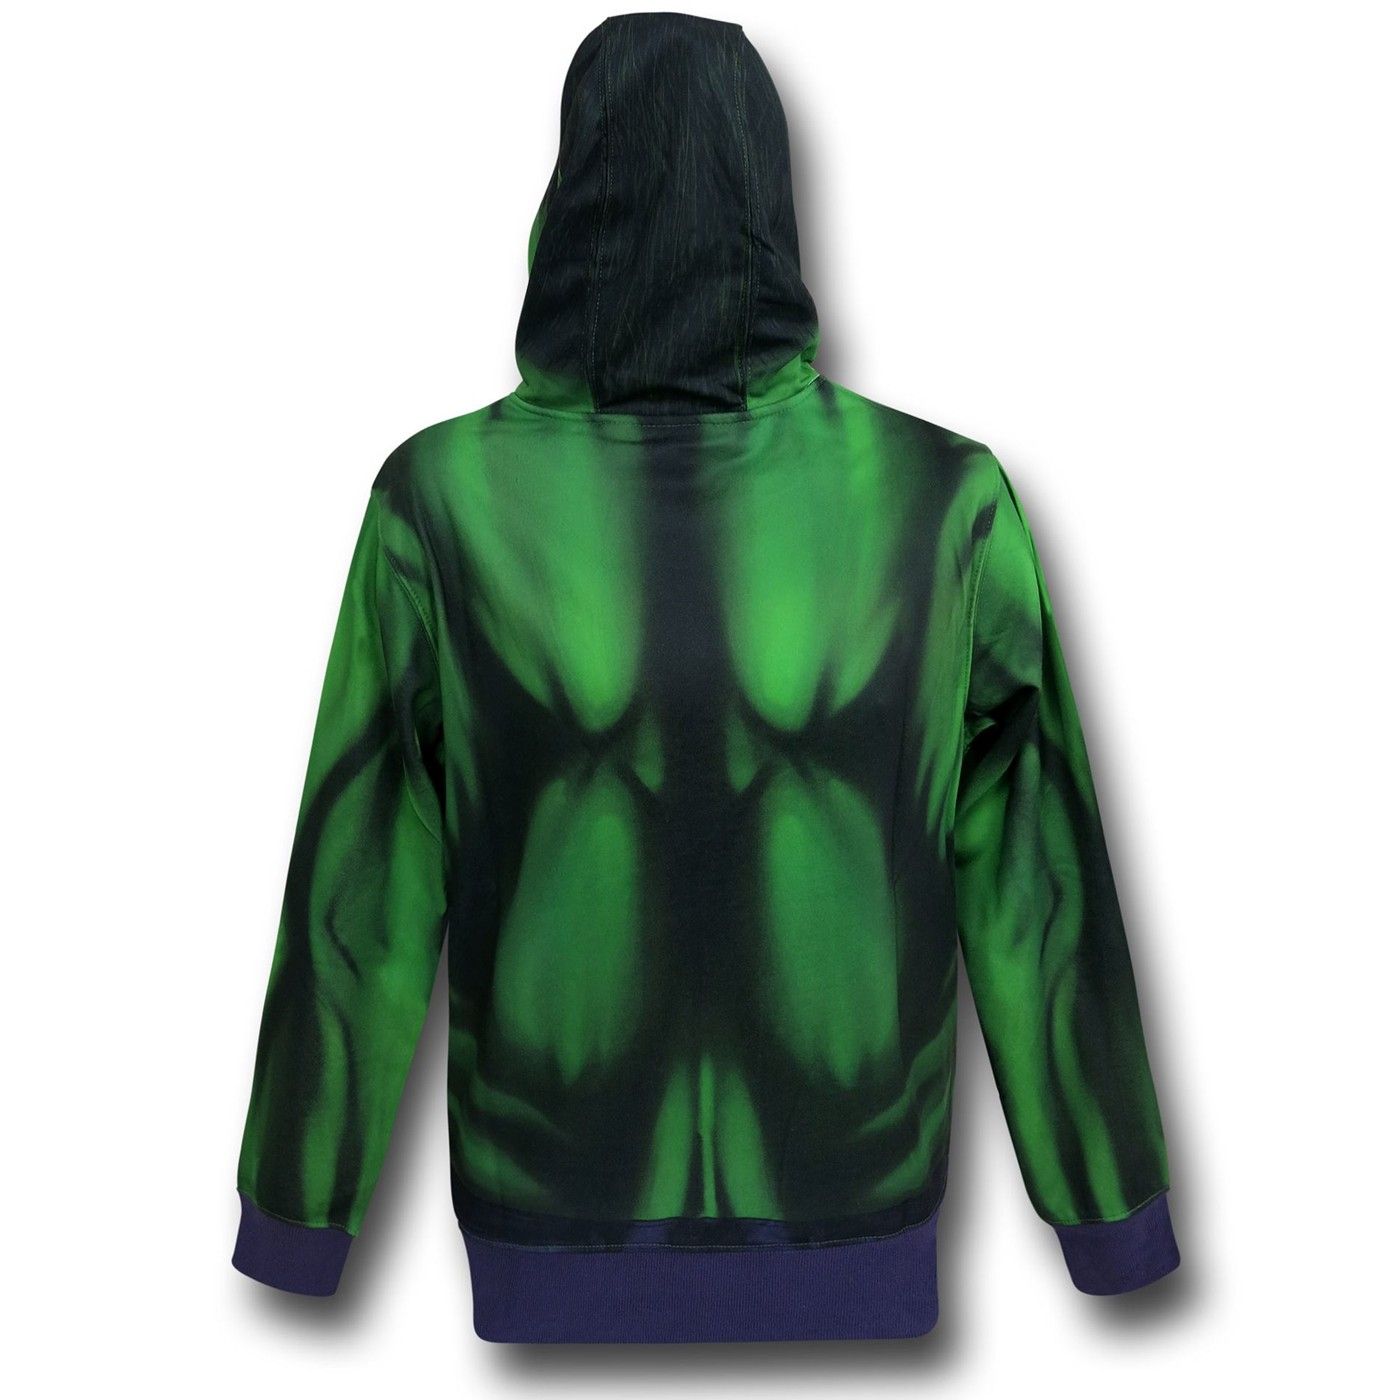 Hulk Lightweight Sublimated Costume Zip-Up Hoodie